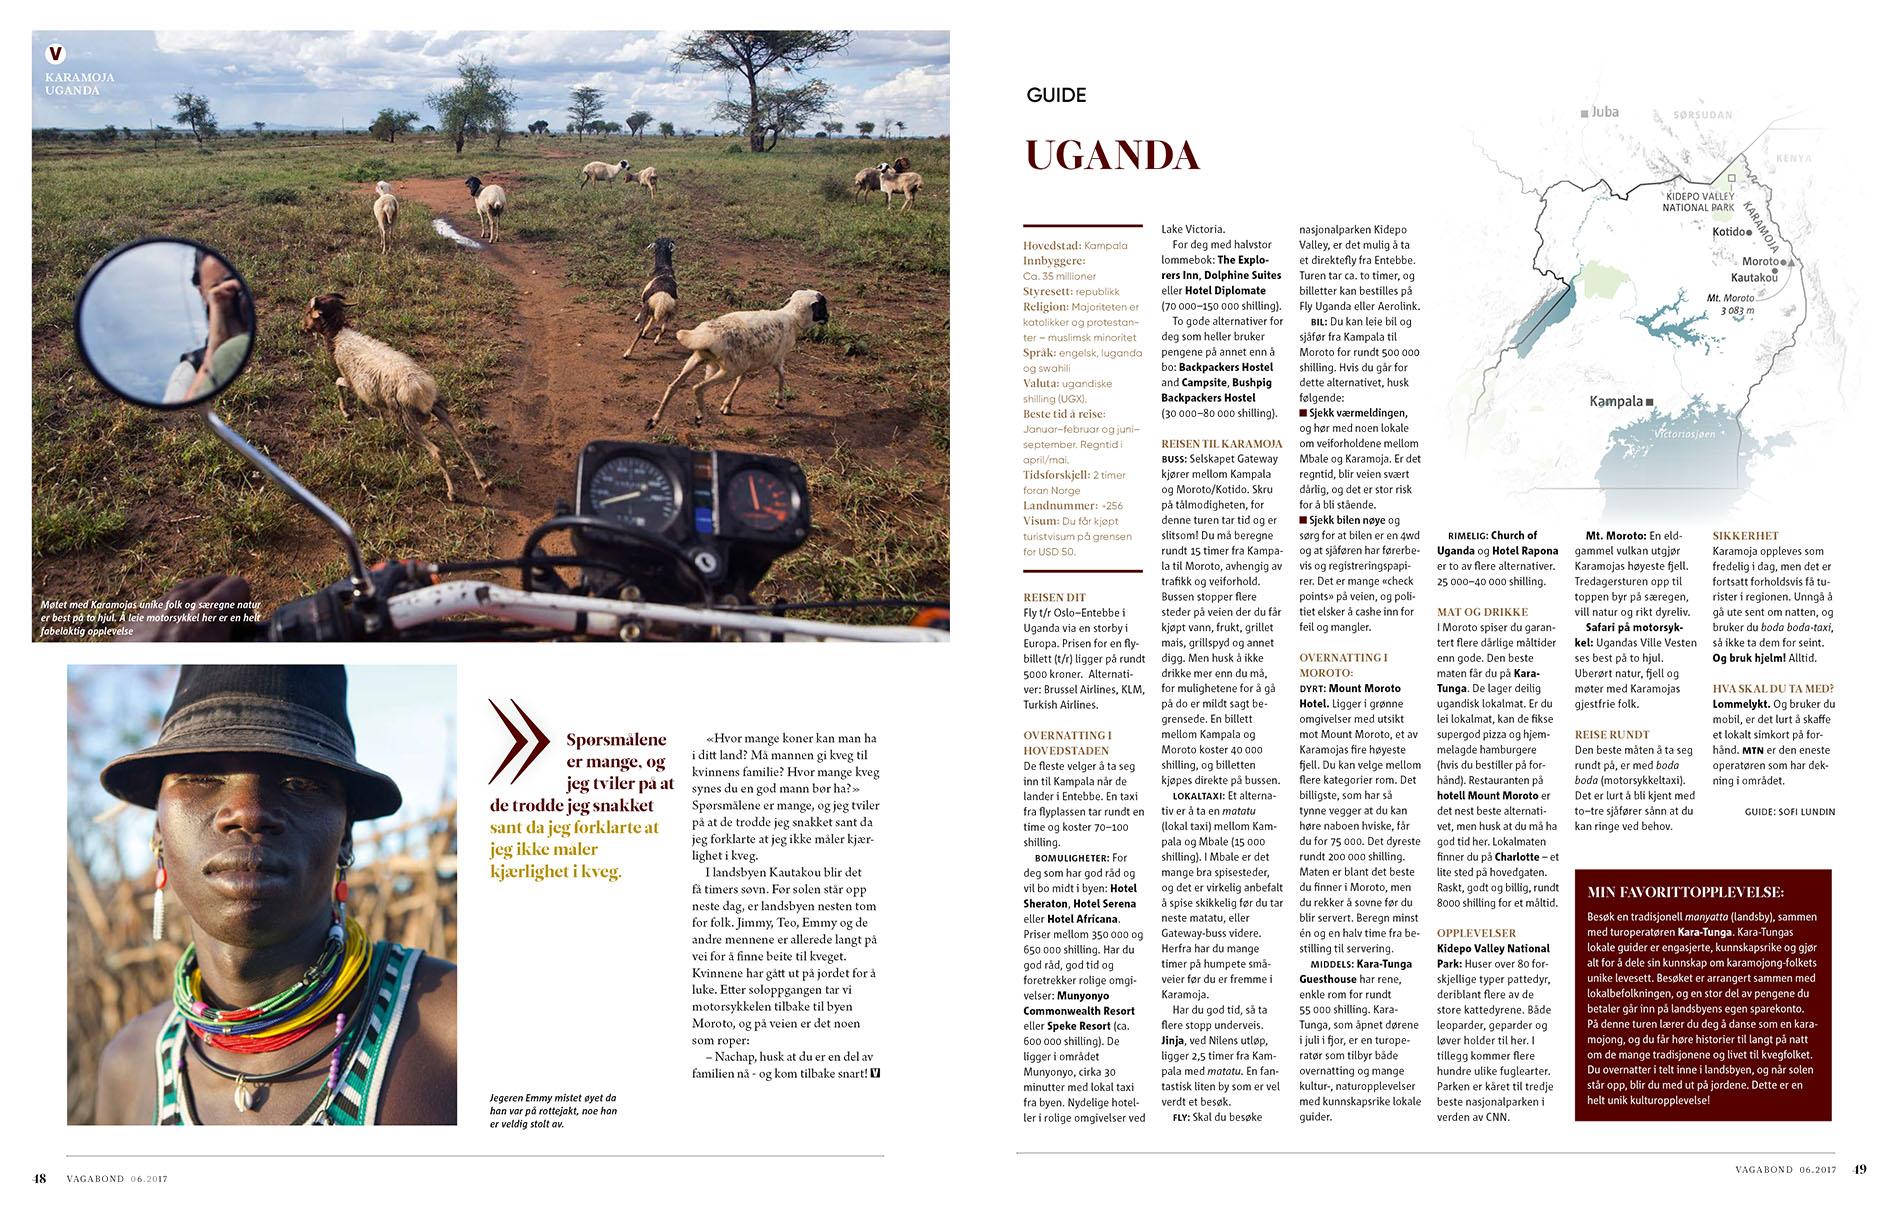 Travel Story from Karamoja